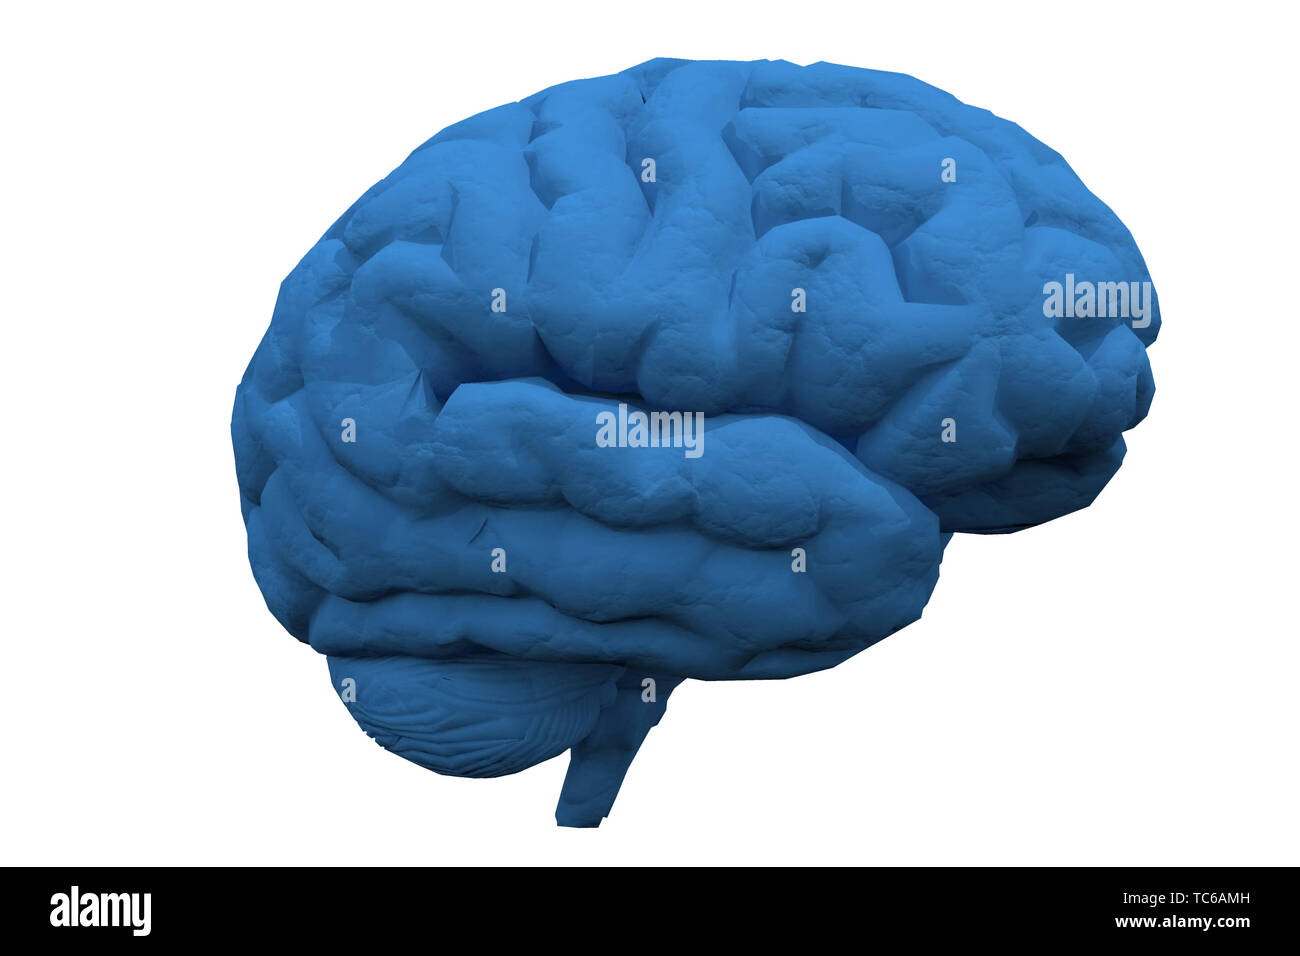 Human brain. 3D rendered model - Stock Image